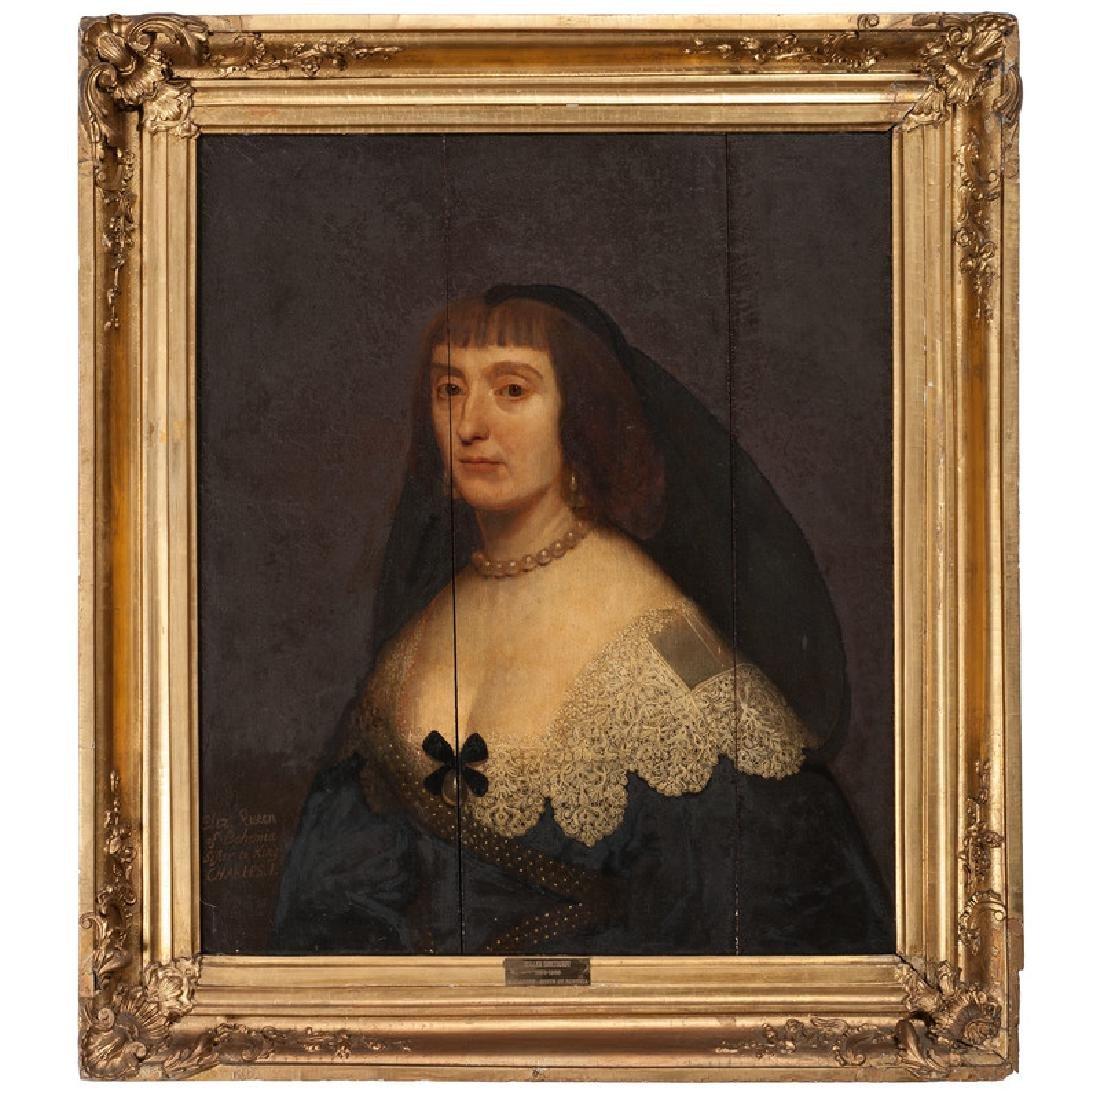 Attributed to Gerrit van Honthorst, Portrait of